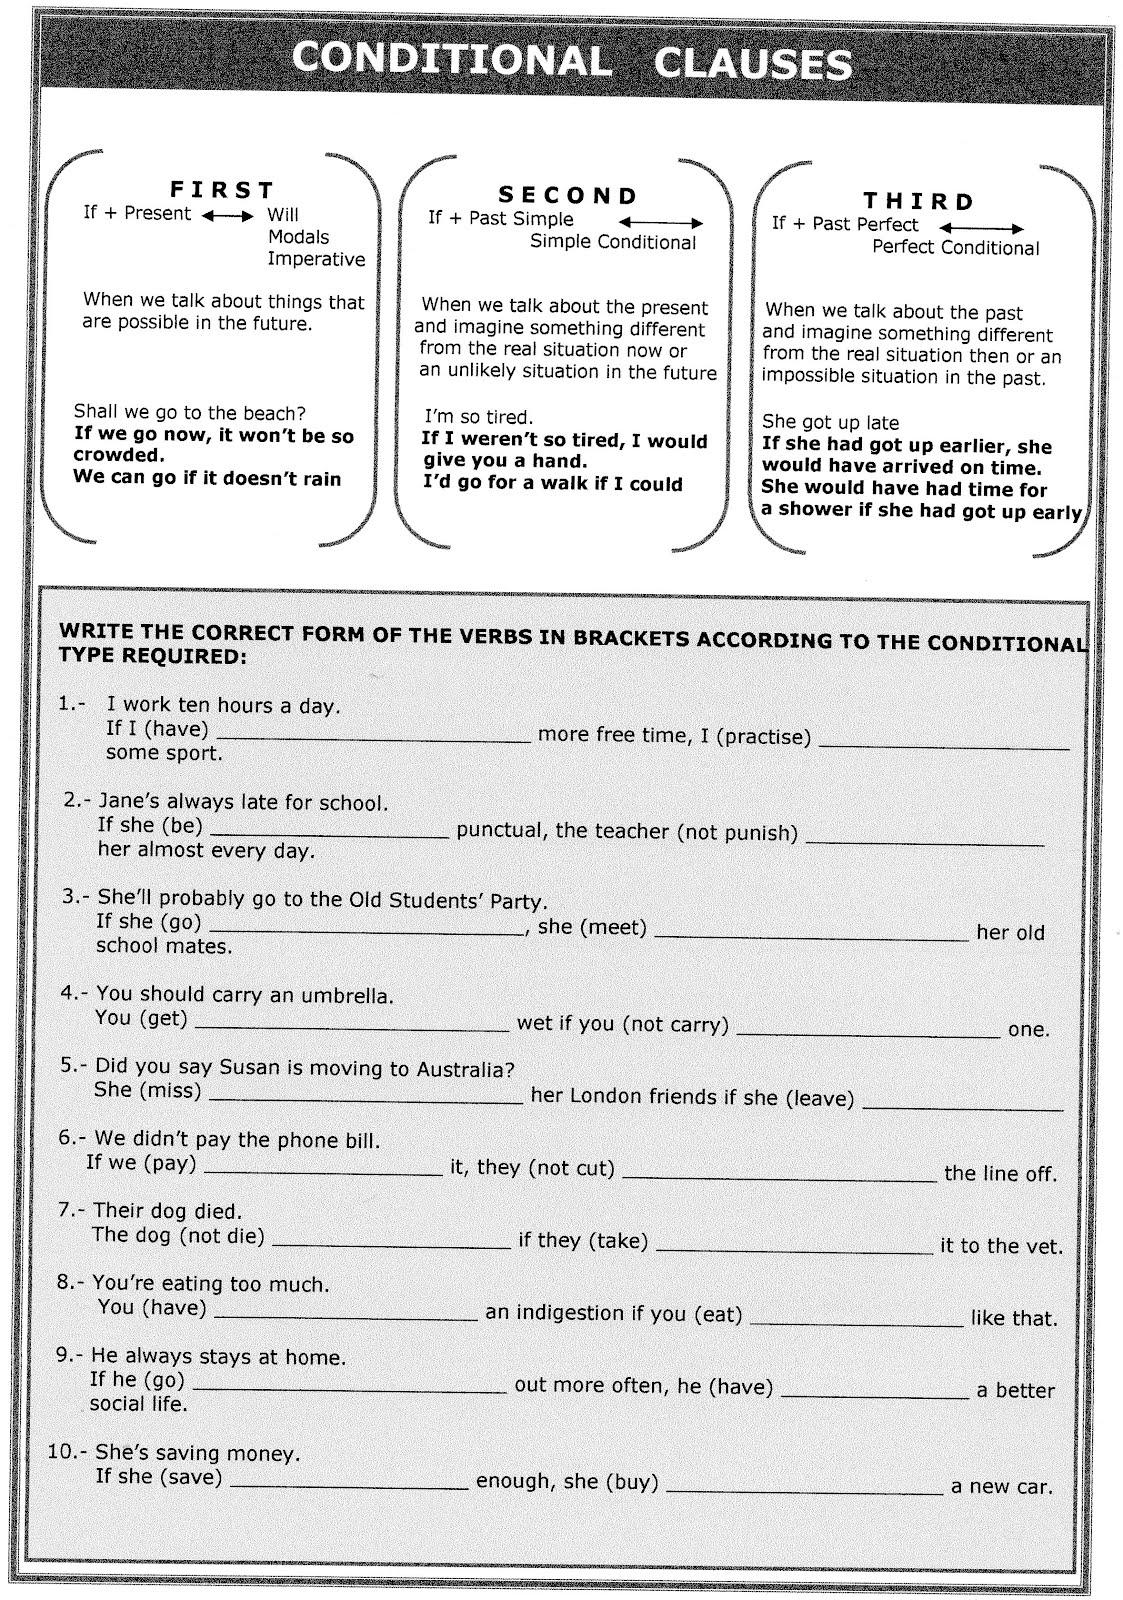 English For U Conditional Sentences Worksheet